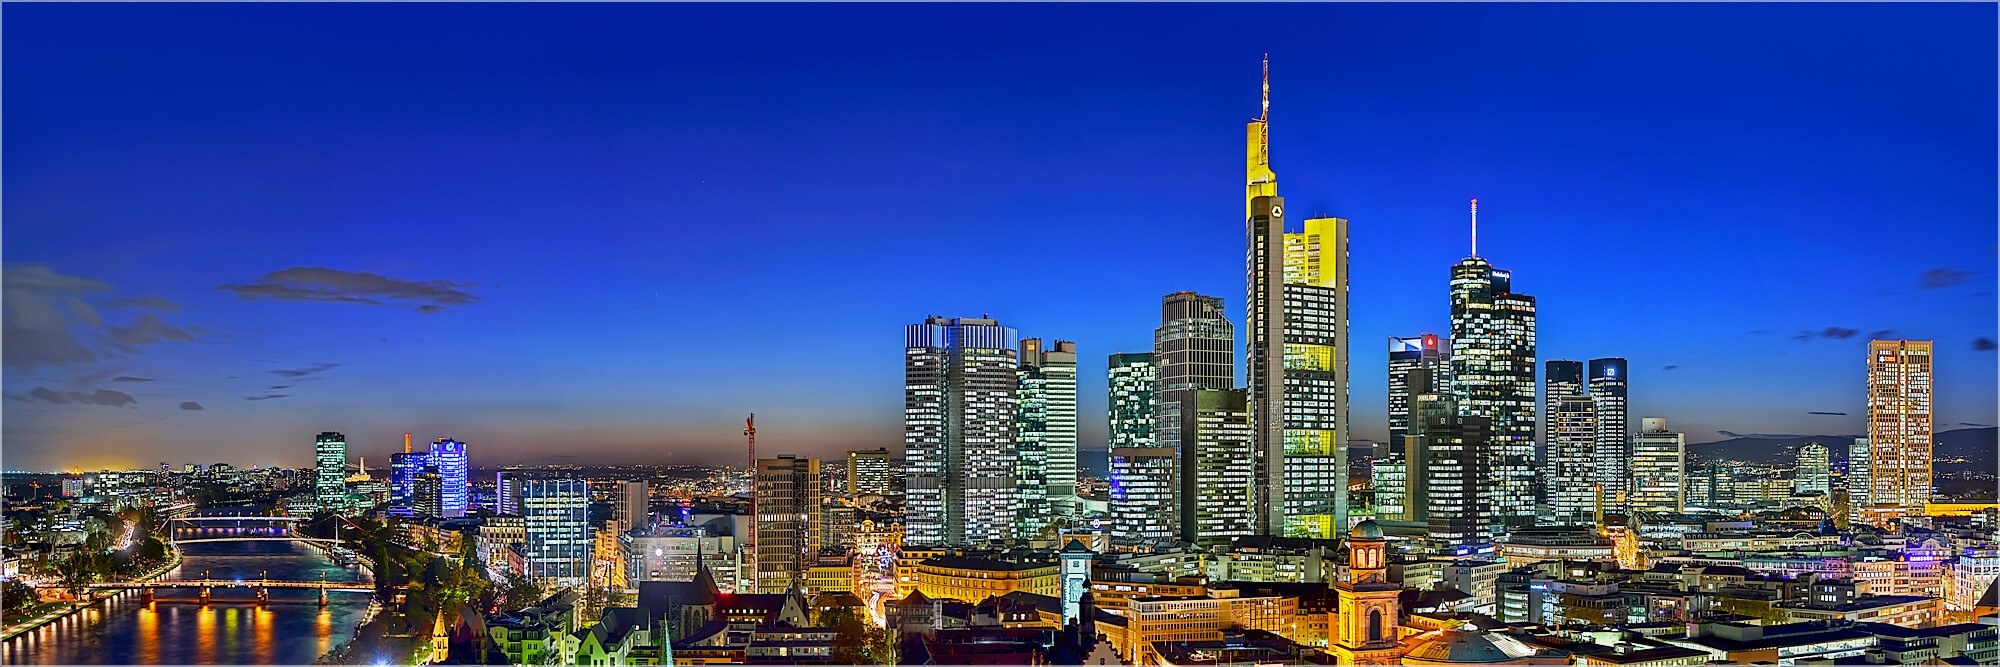 Panoramafoto Skyline Bankenviertel Frankfurt/Main